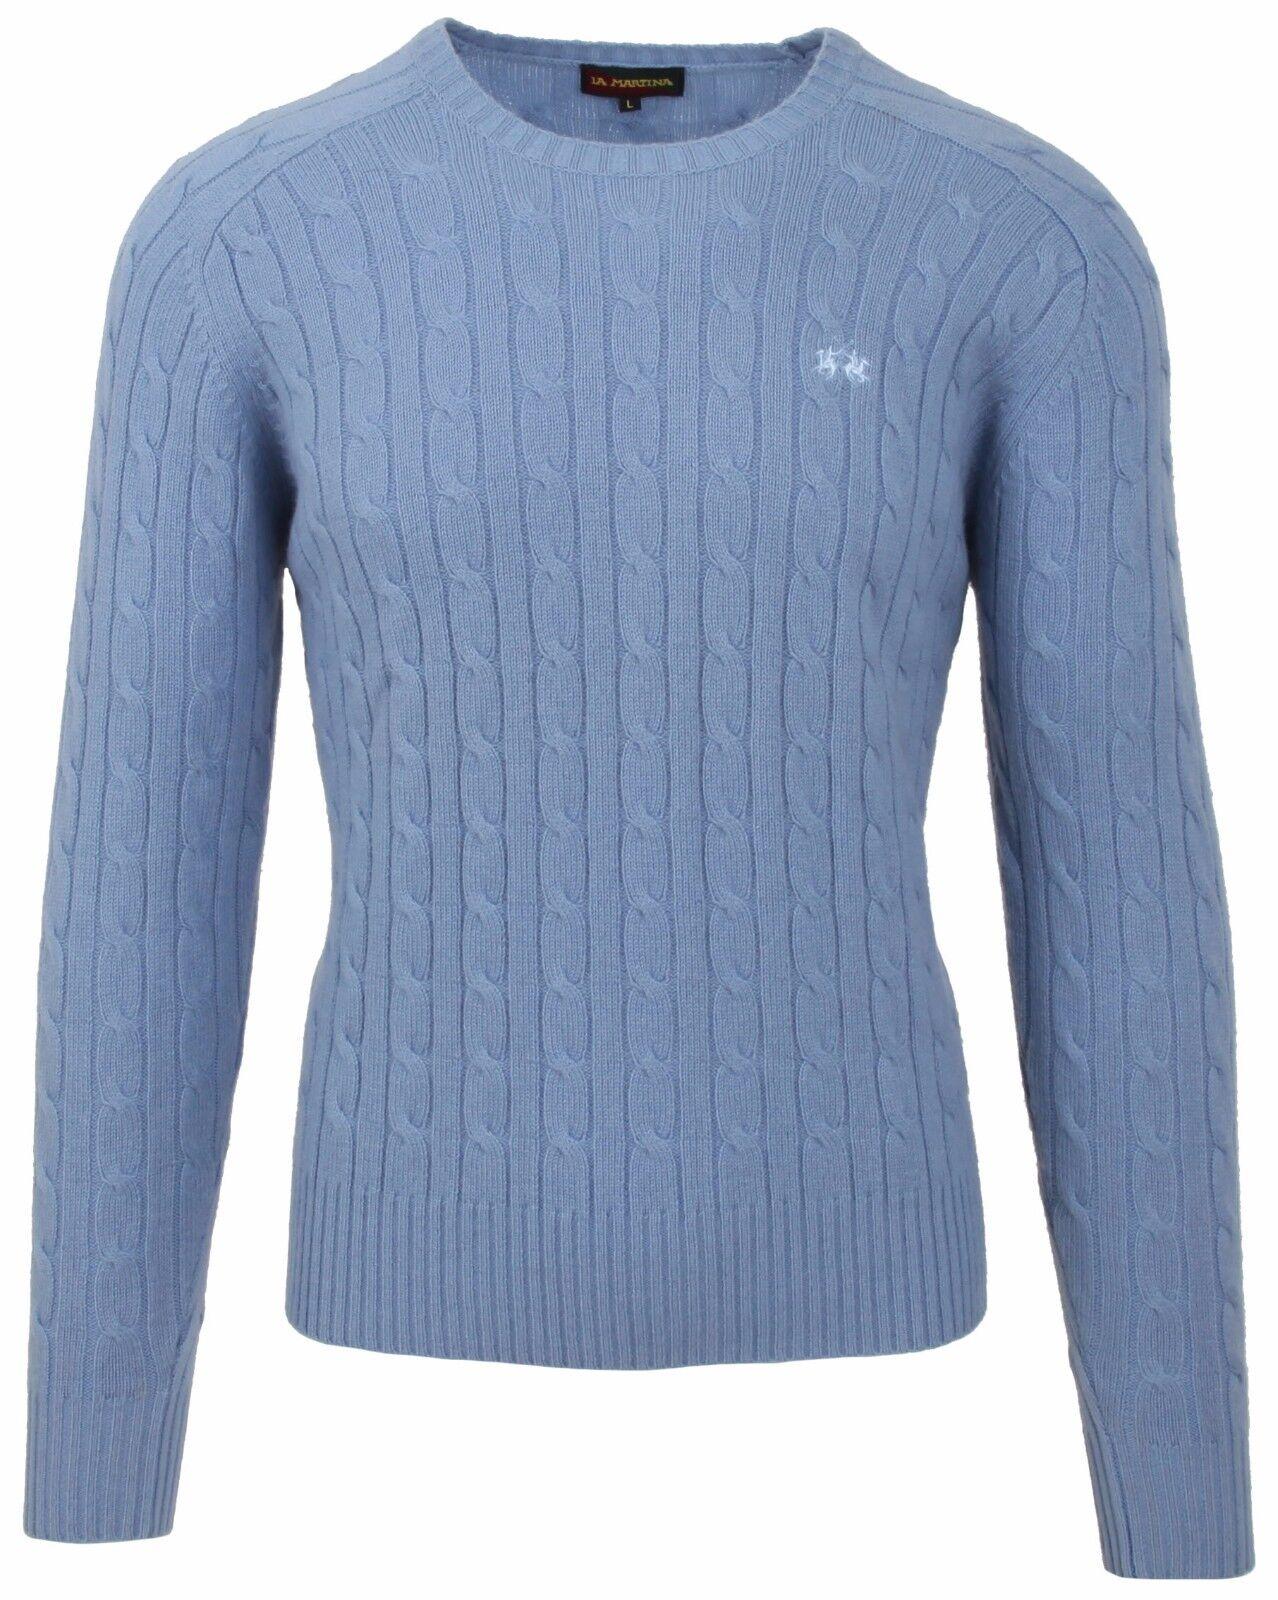 LA MARTINA POLO Pullover Sweater Jumper Größe L aus Kaschmir & Merino Wolle Blau